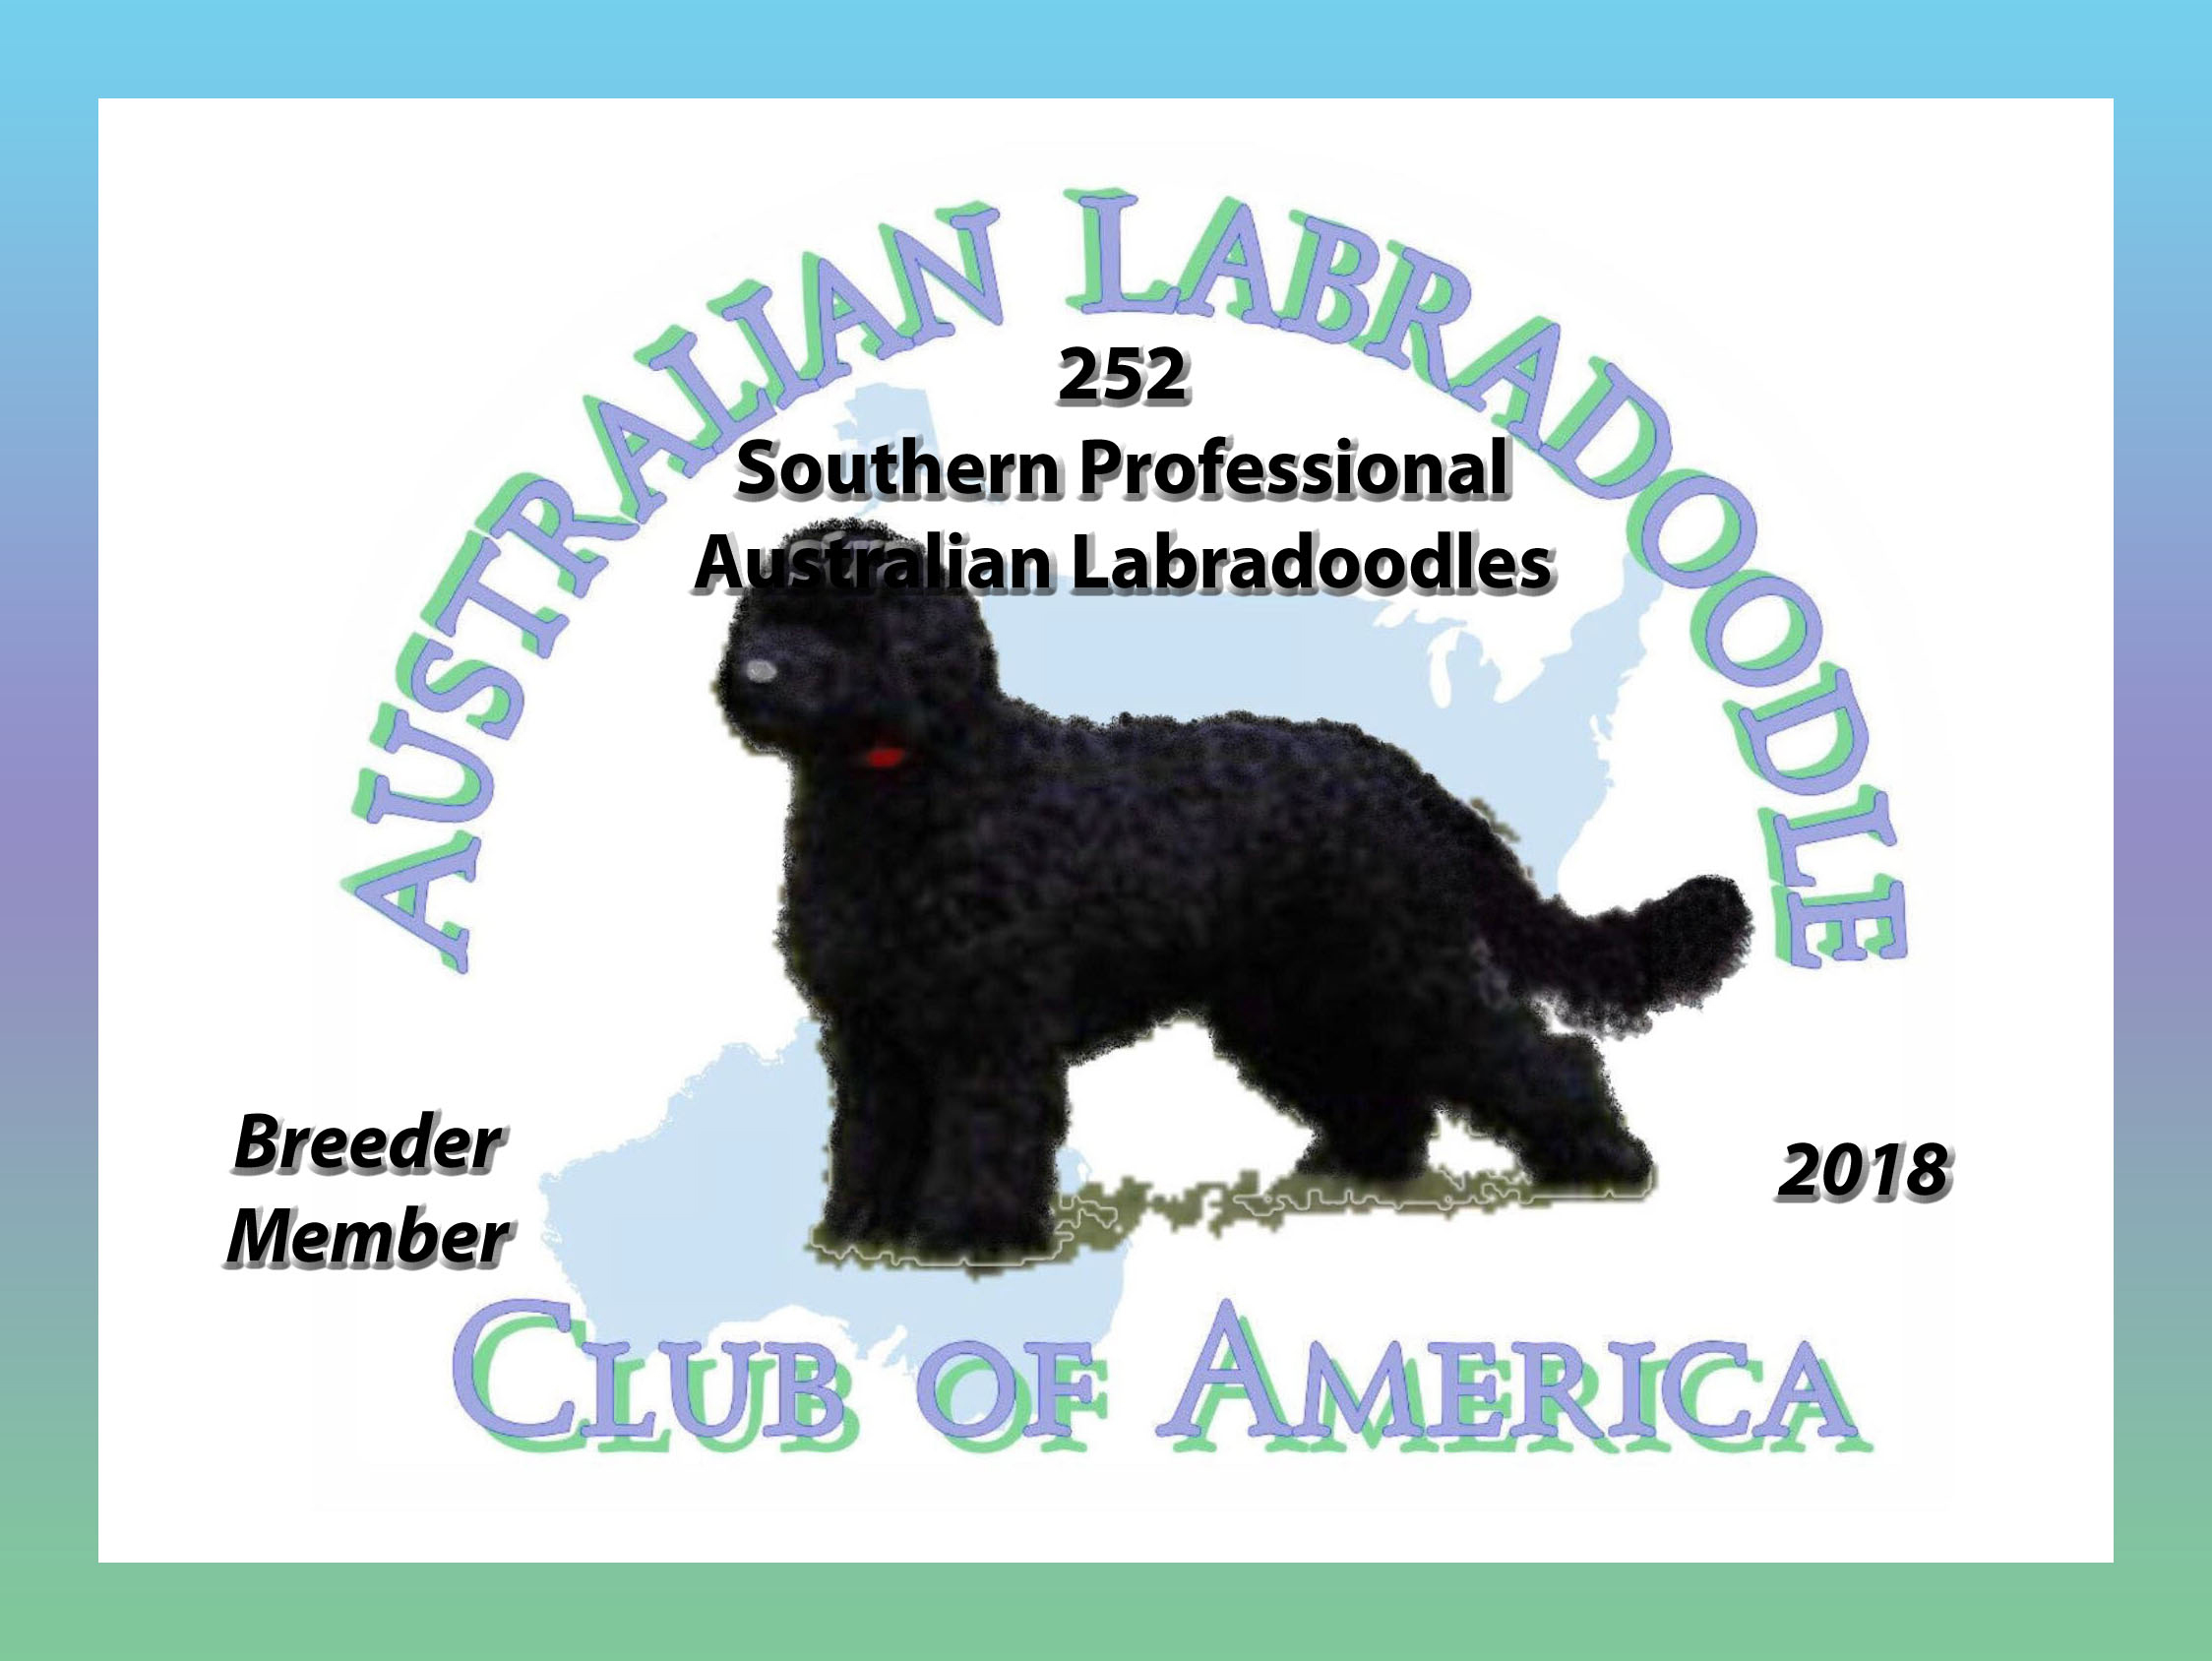 Australian-Labradoodle-Club-Of-America-2018